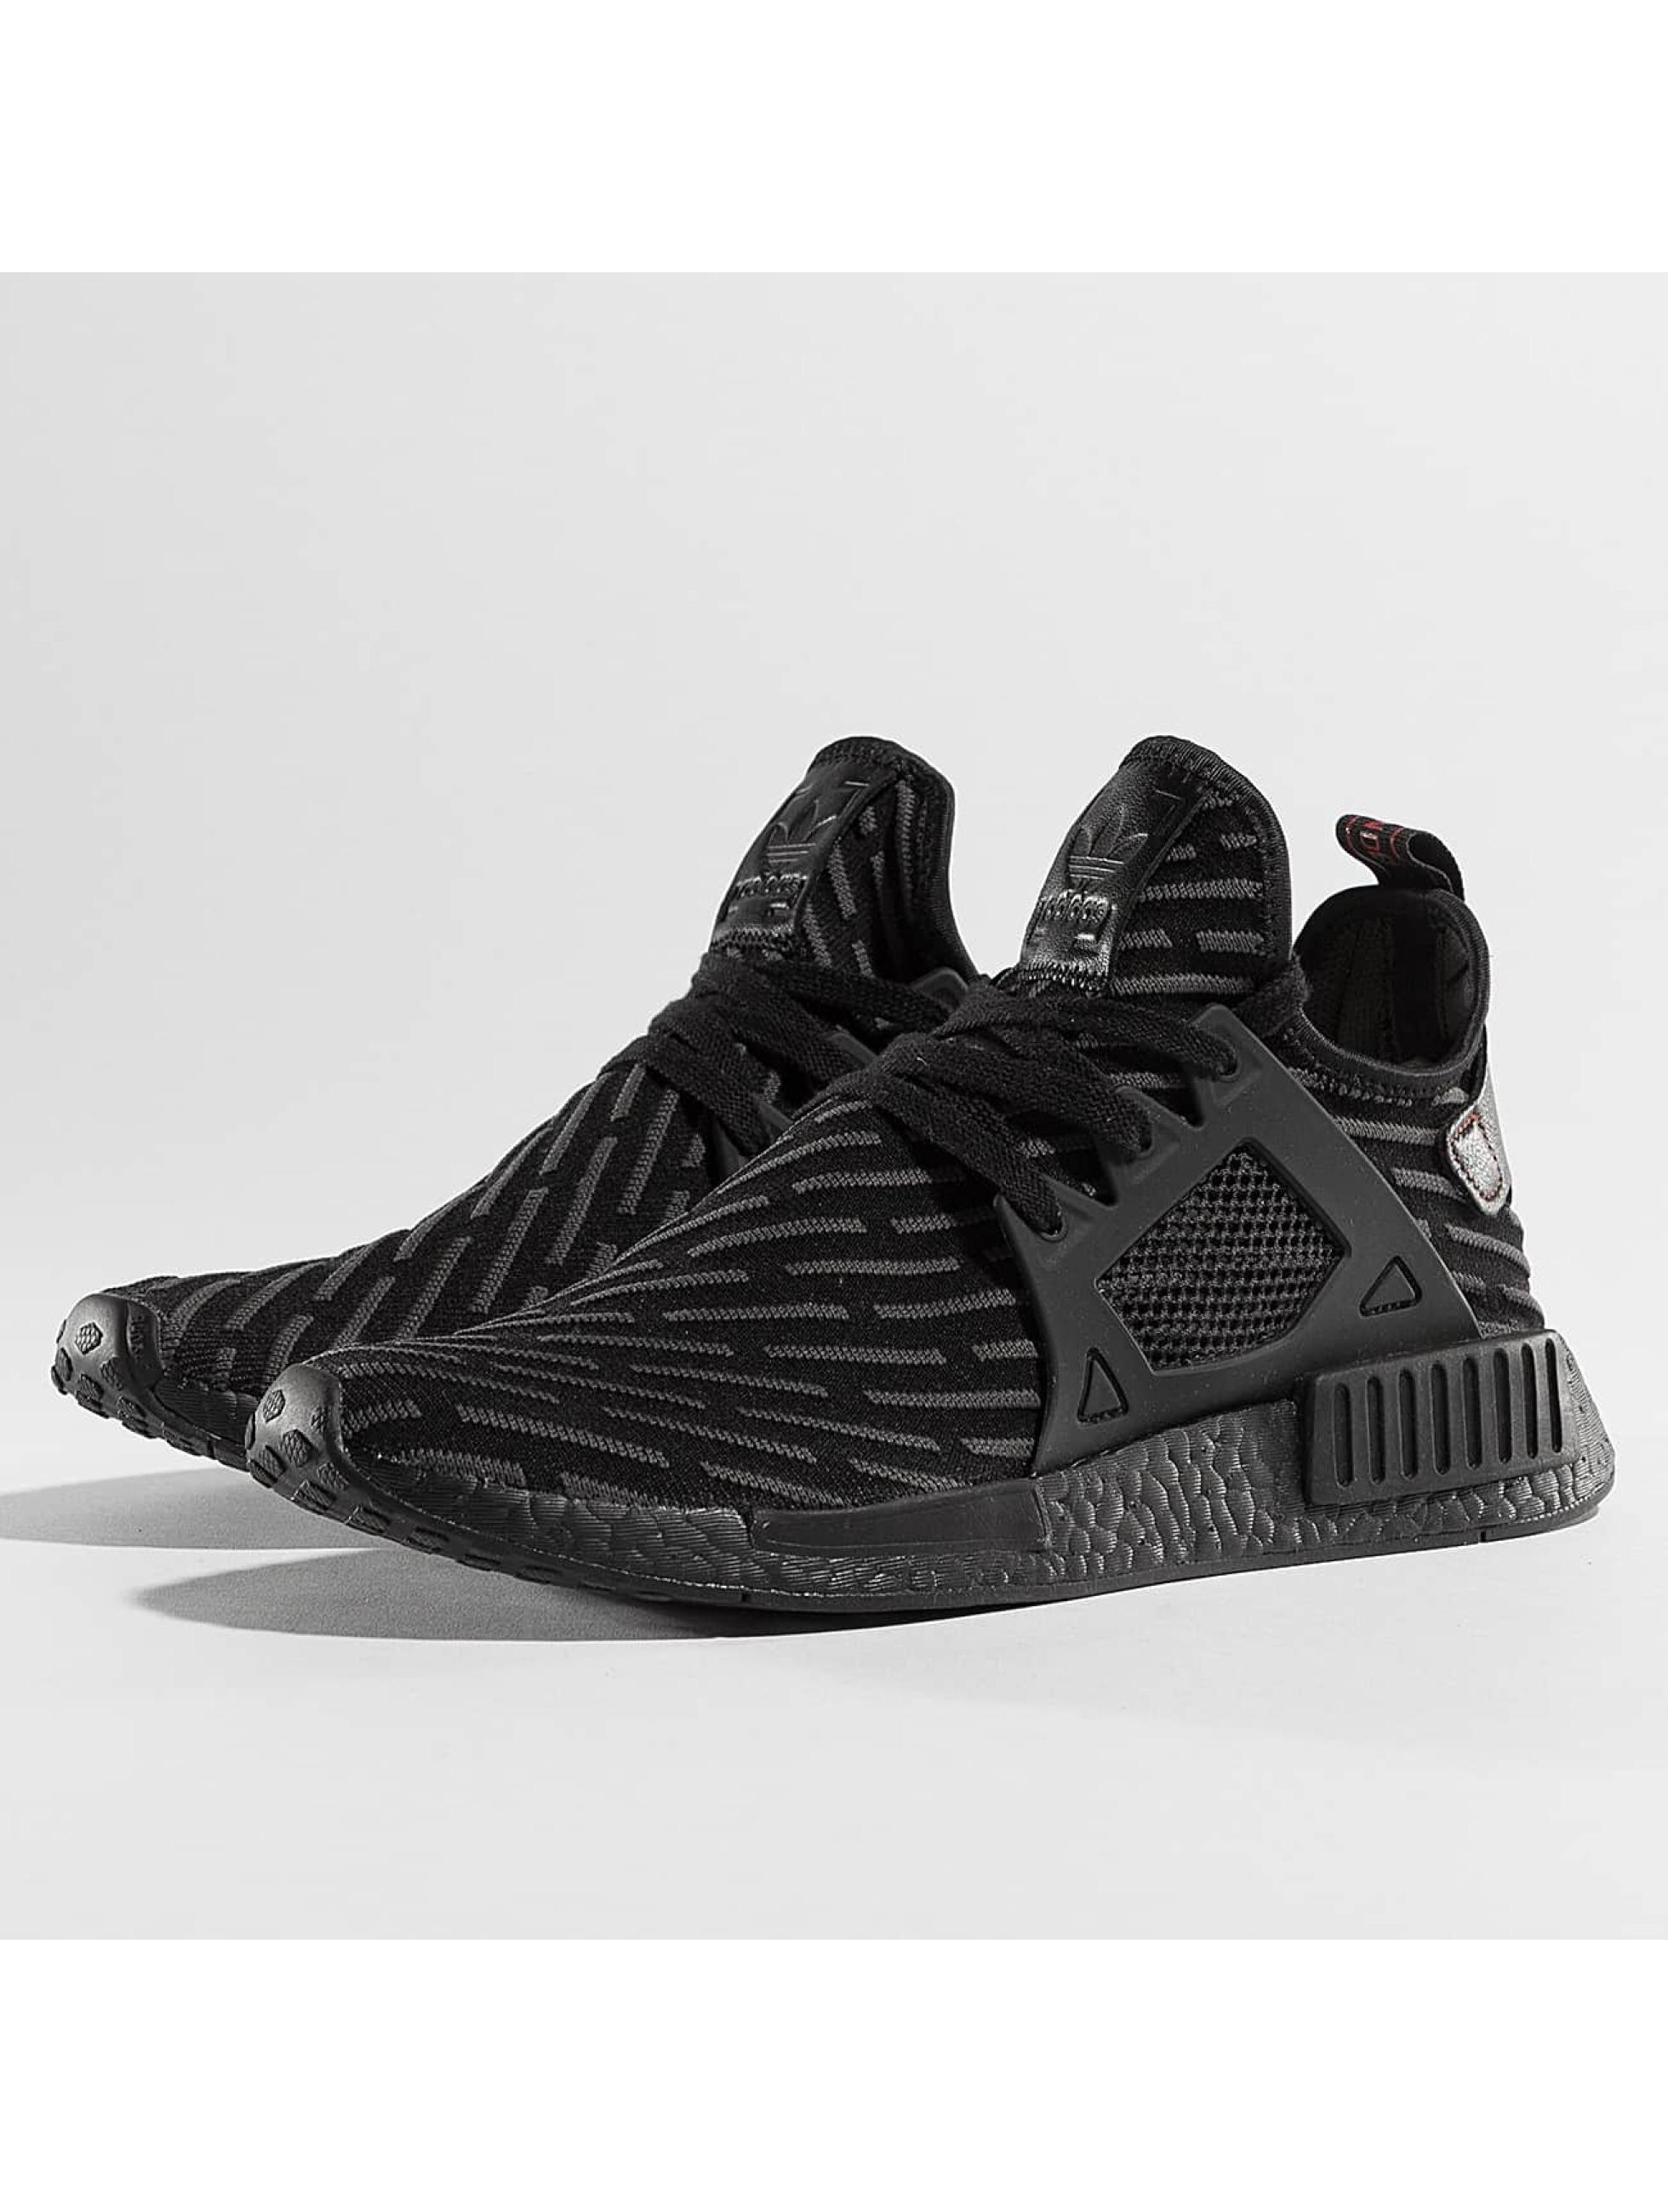 adidas sneaker nmd xr1 primeknit in schwarz 325477. Black Bedroom Furniture Sets. Home Design Ideas